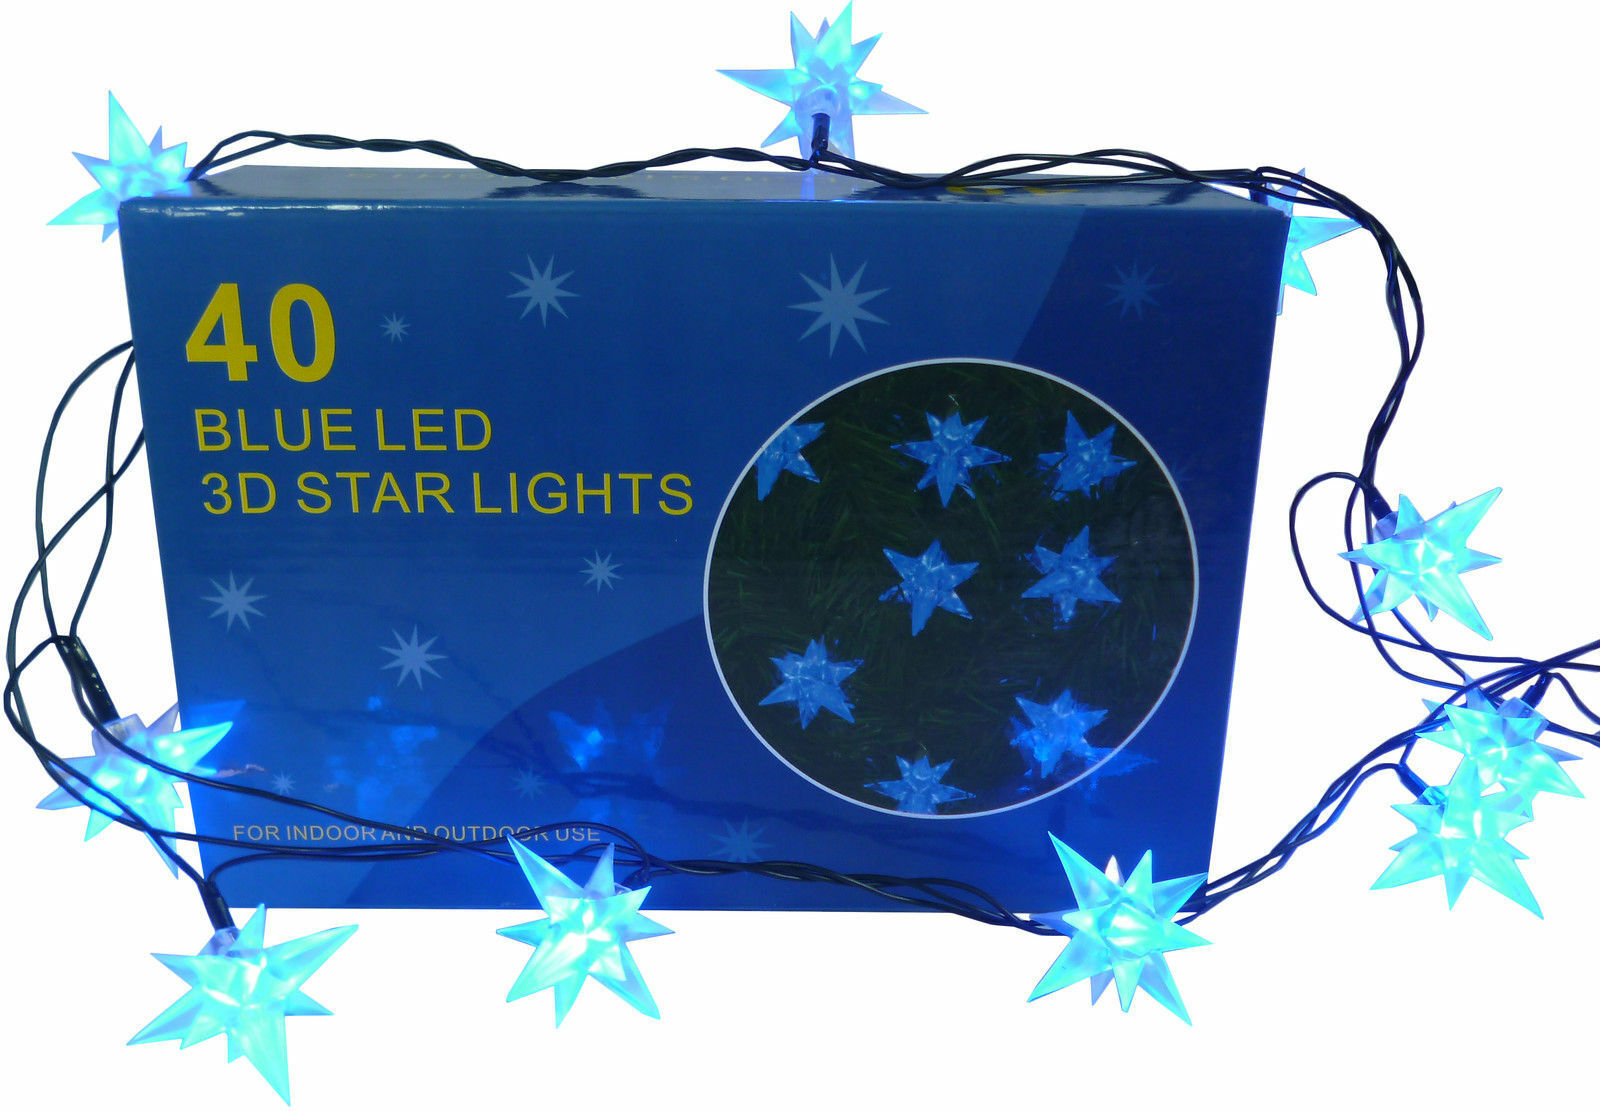 transparentes Kabel Led BLAU 11m LED Lichterkette mit 80 blauen Leds für Innen